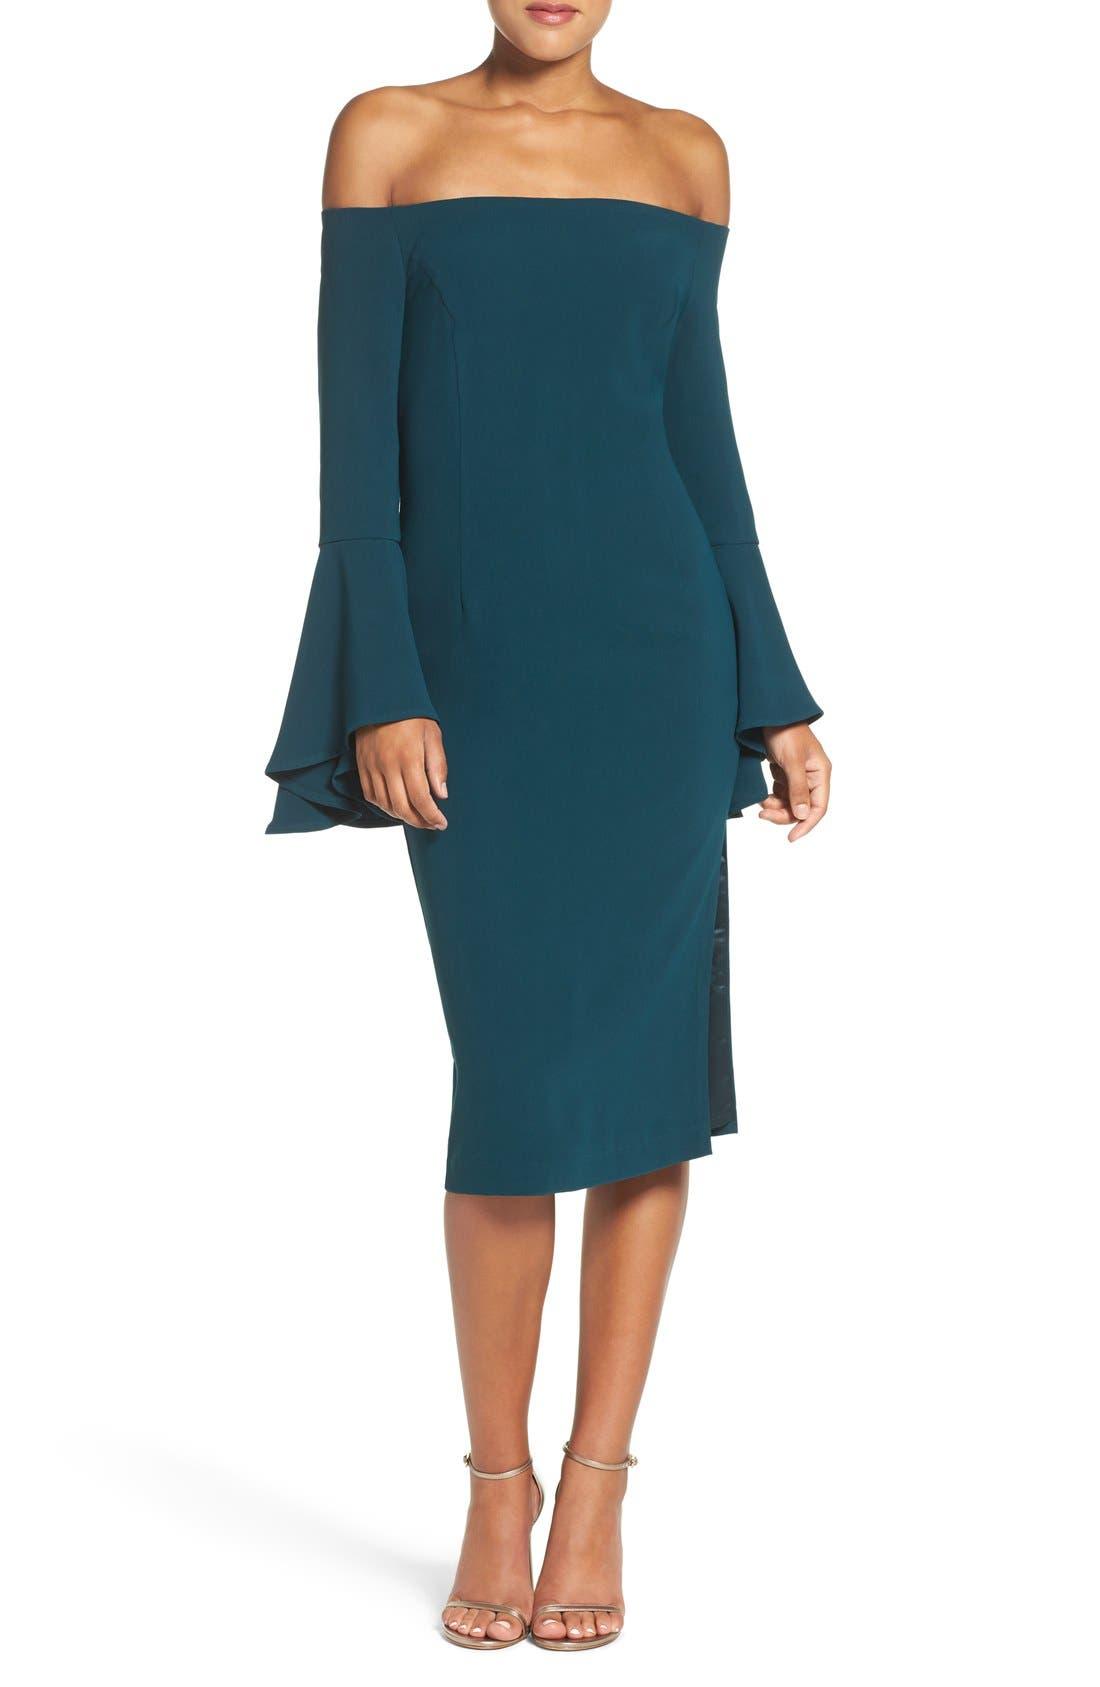 'Solange' Off the Shoulder Midi Dress,                             Main thumbnail 1, color,                             Teal